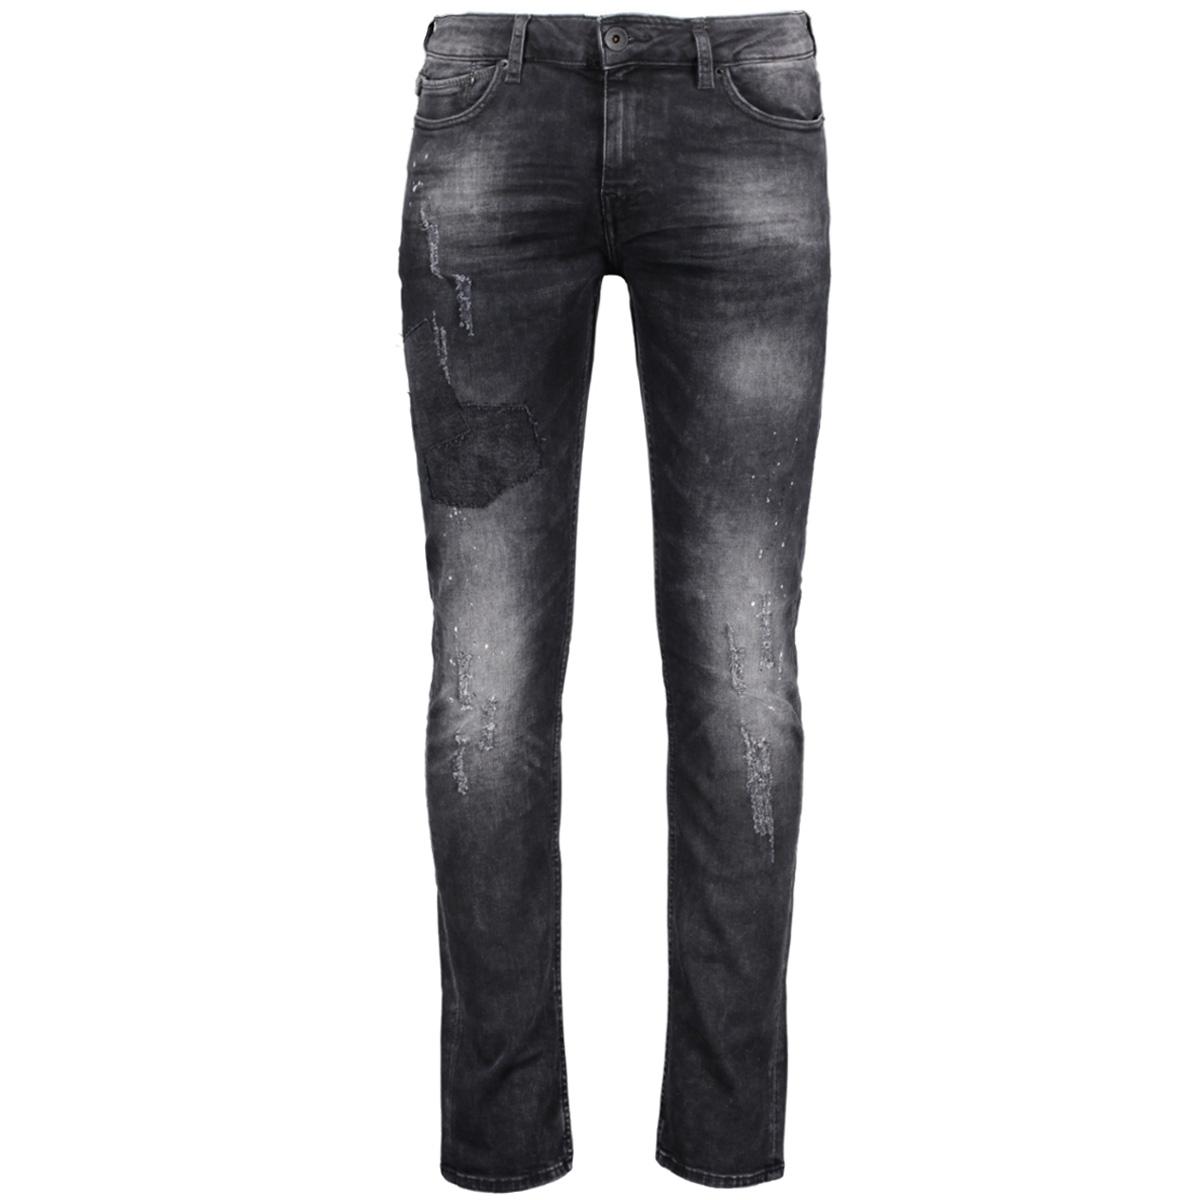 j71321 fermo garcia jeans 2521 black vintage